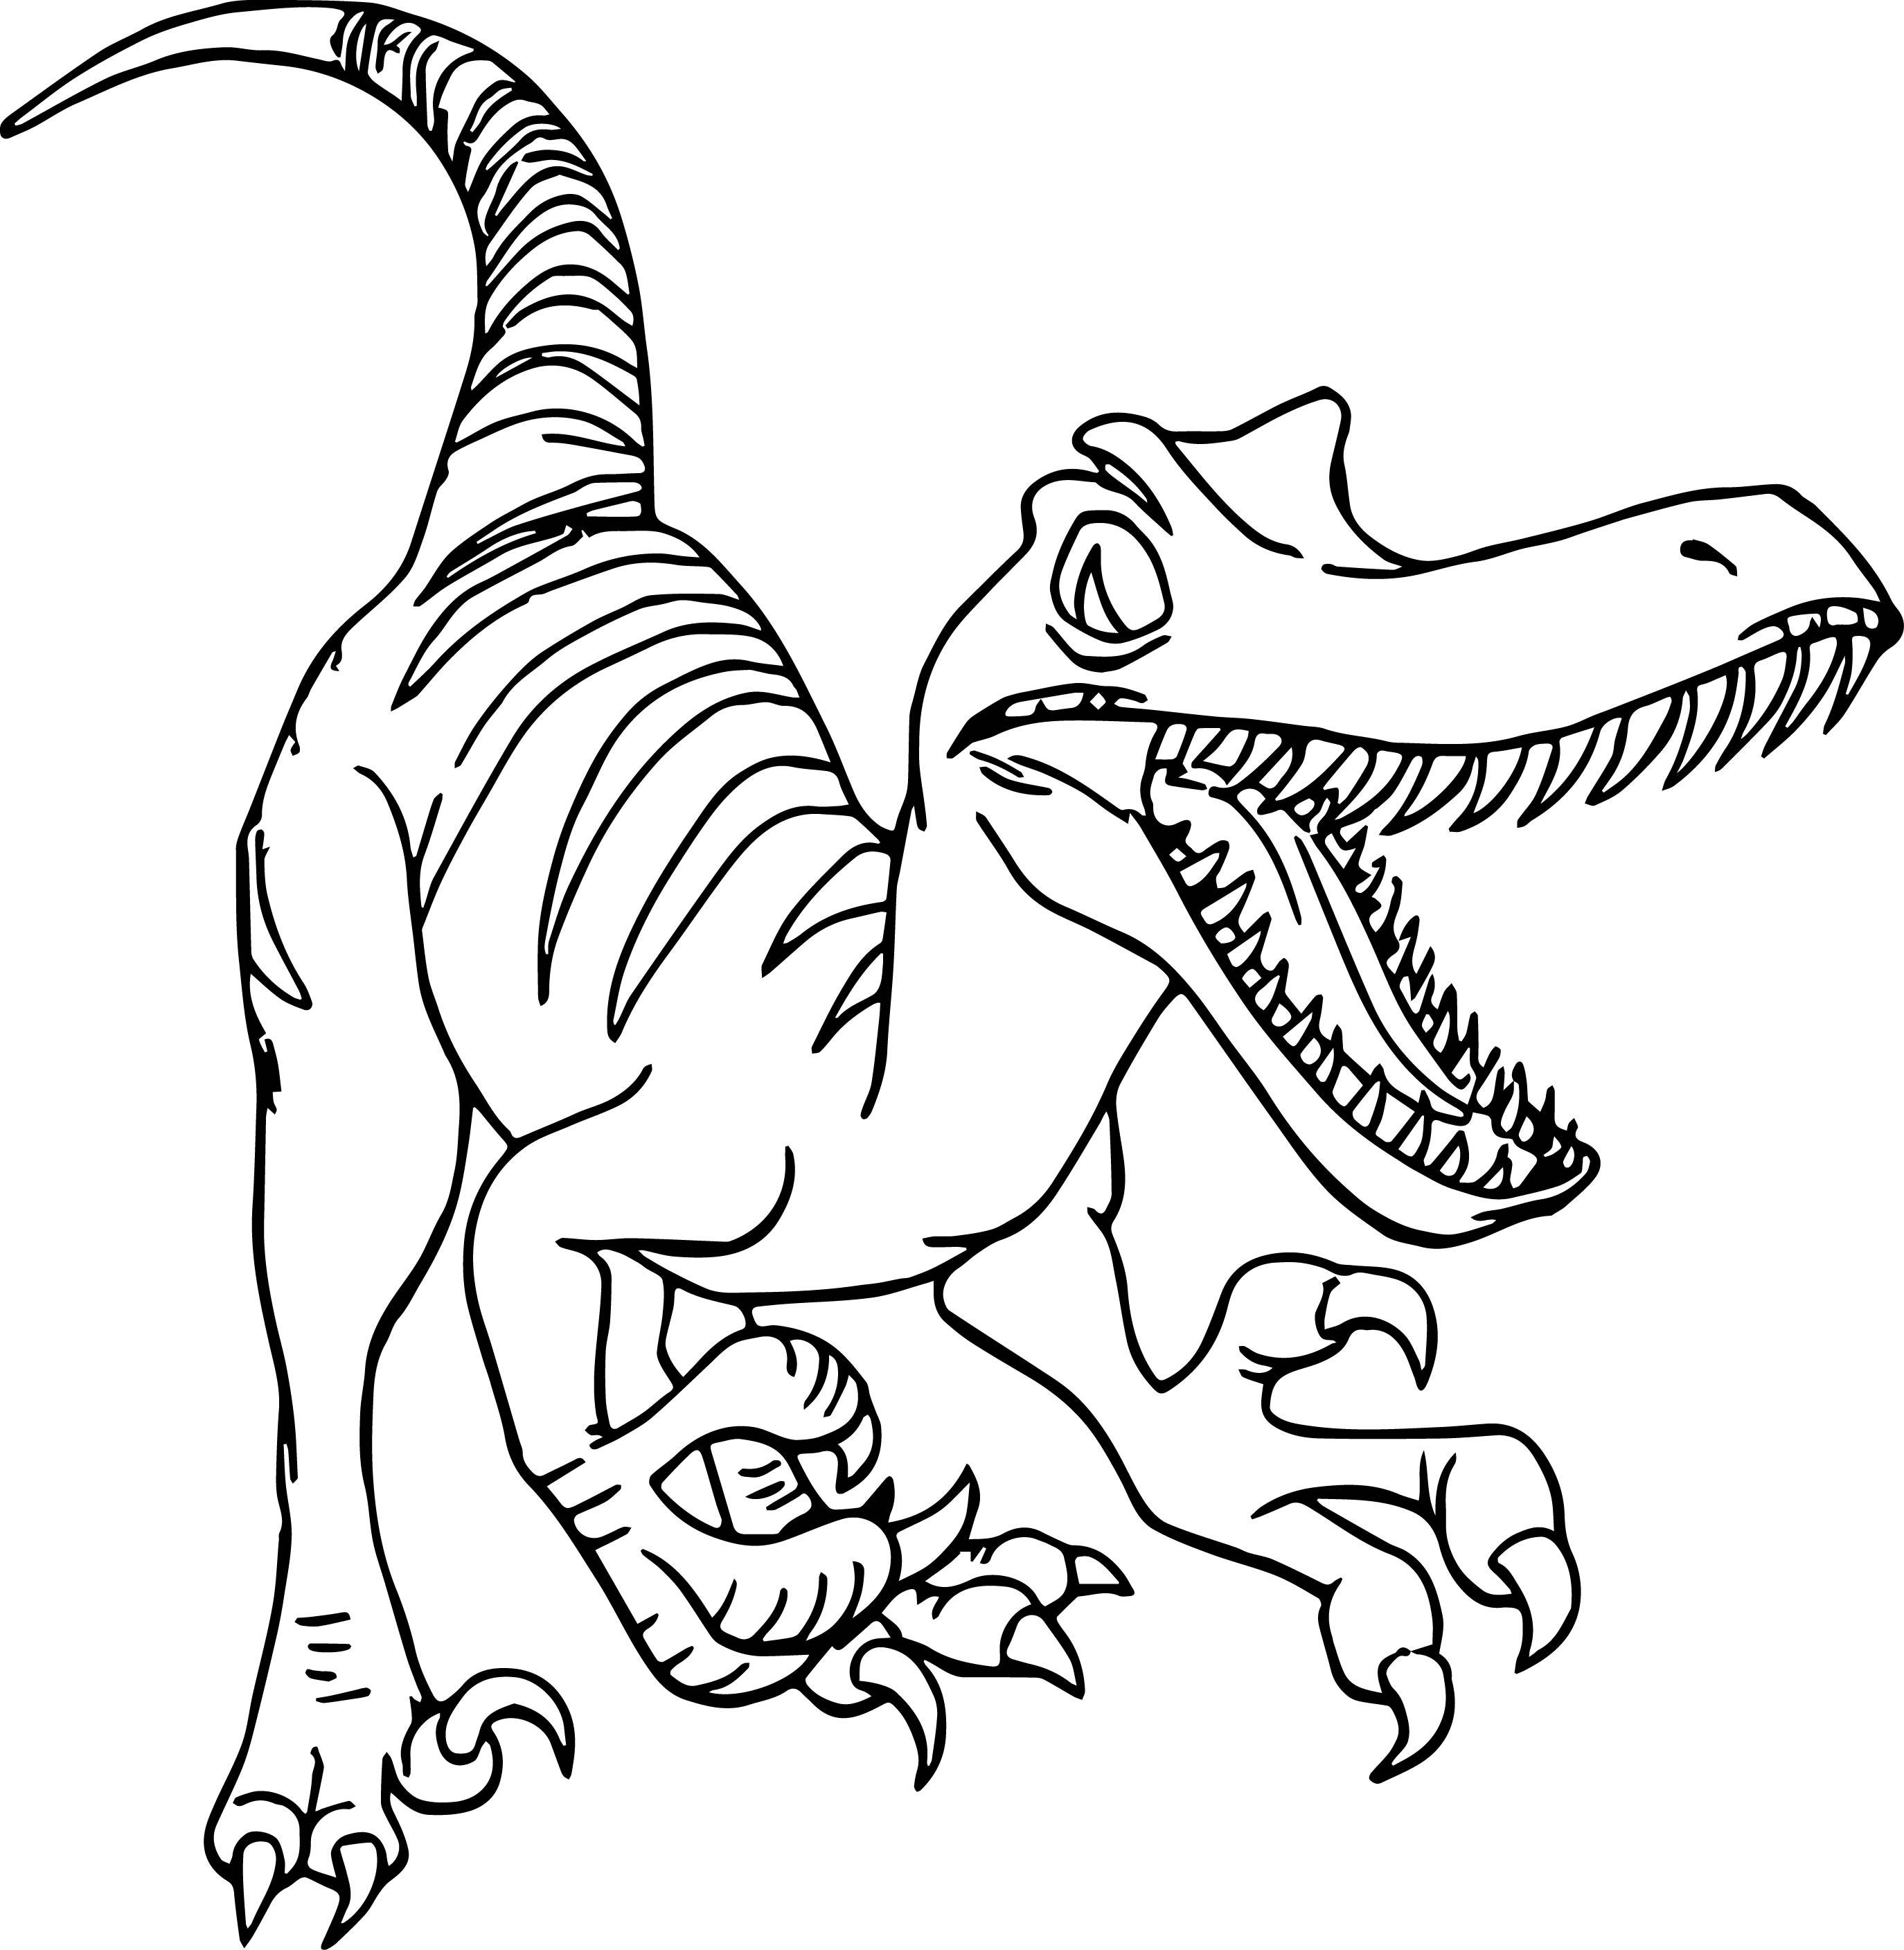 Raptor Dinosaur Coloring Pages At Getdrawings